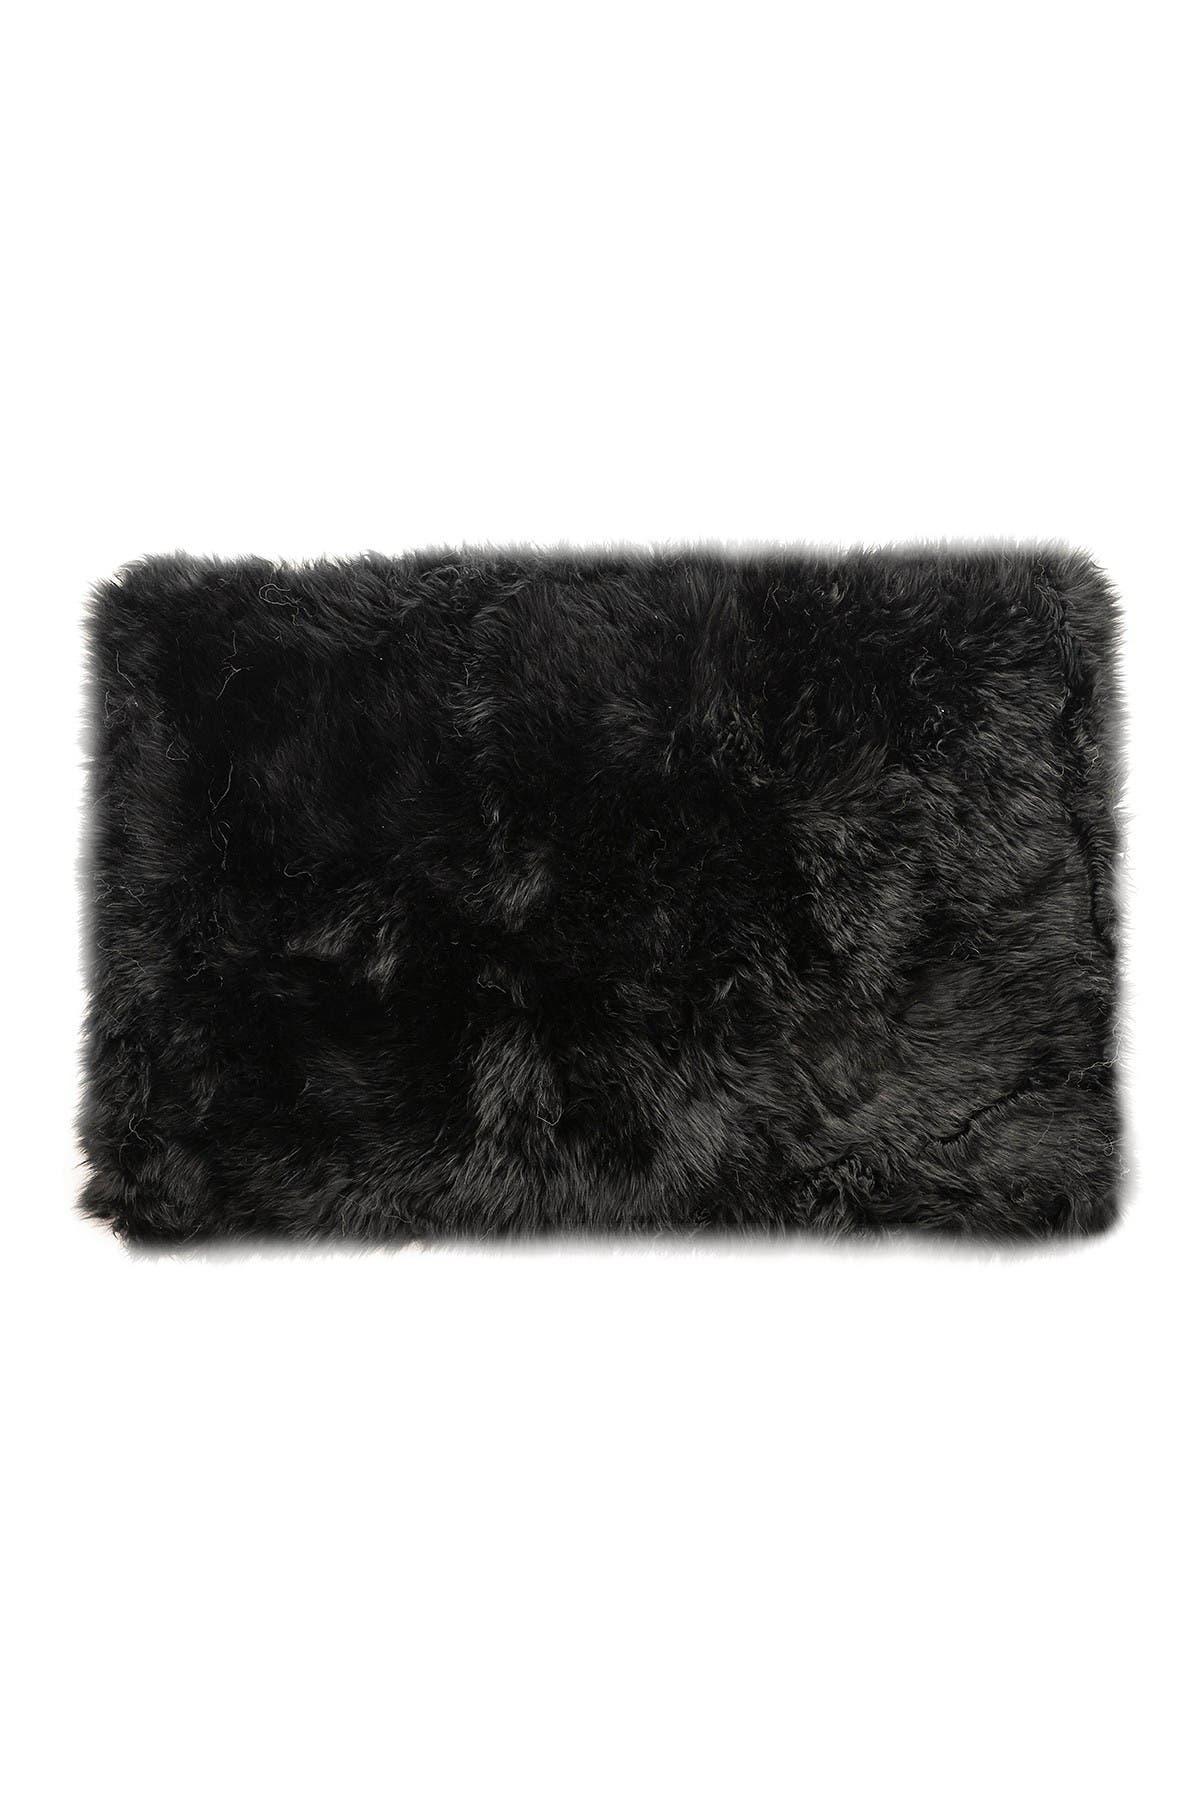 Image of Natural New Zealand Rectangular Sheepskin Throw - 2ft X 3ft - Black